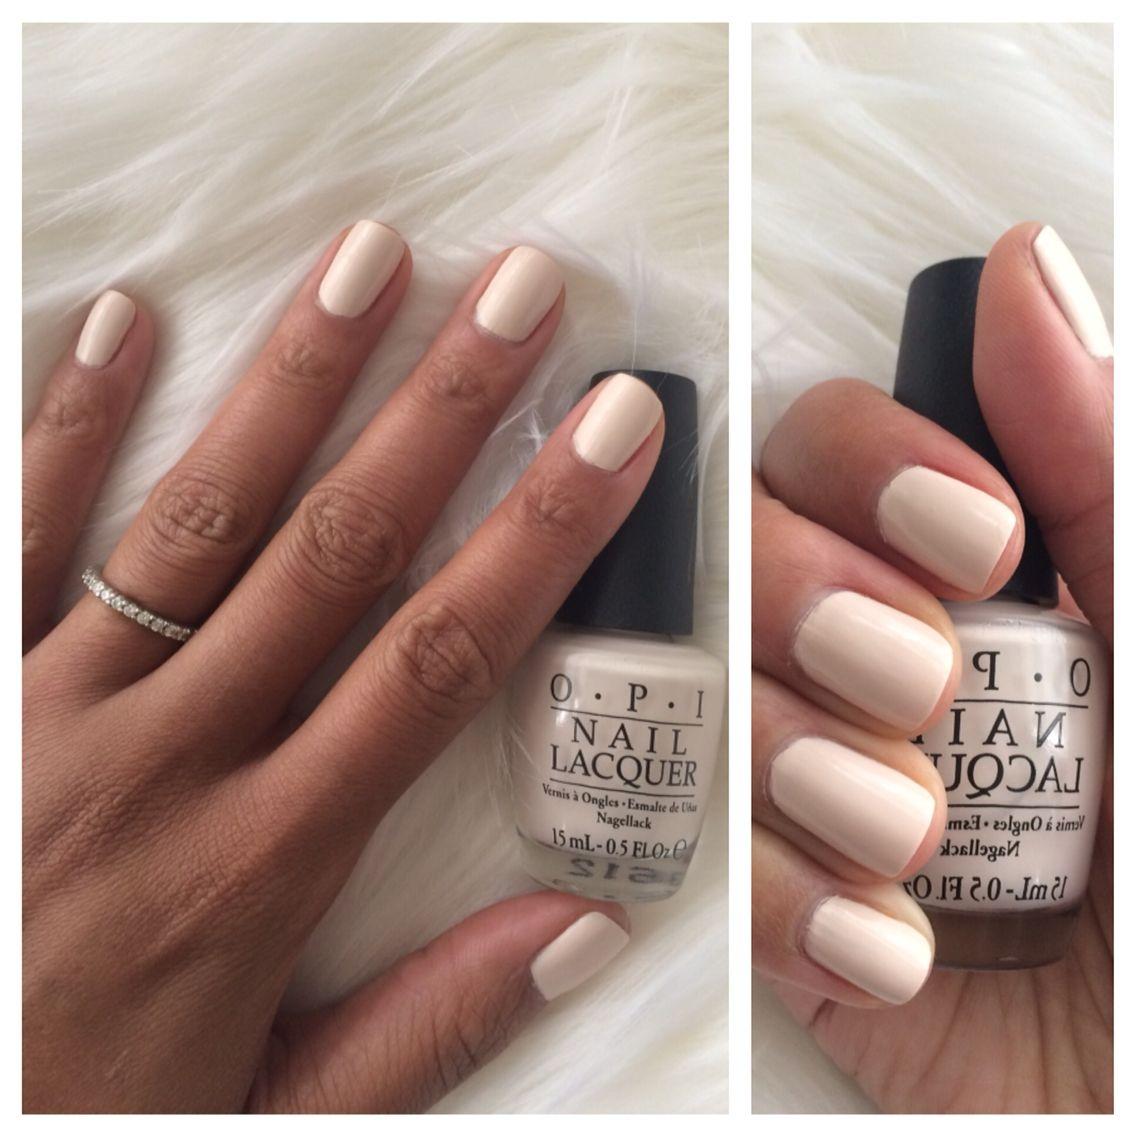 OPI Be There In A Prosecco #nails #polish | Nails, Nails, Nails ...